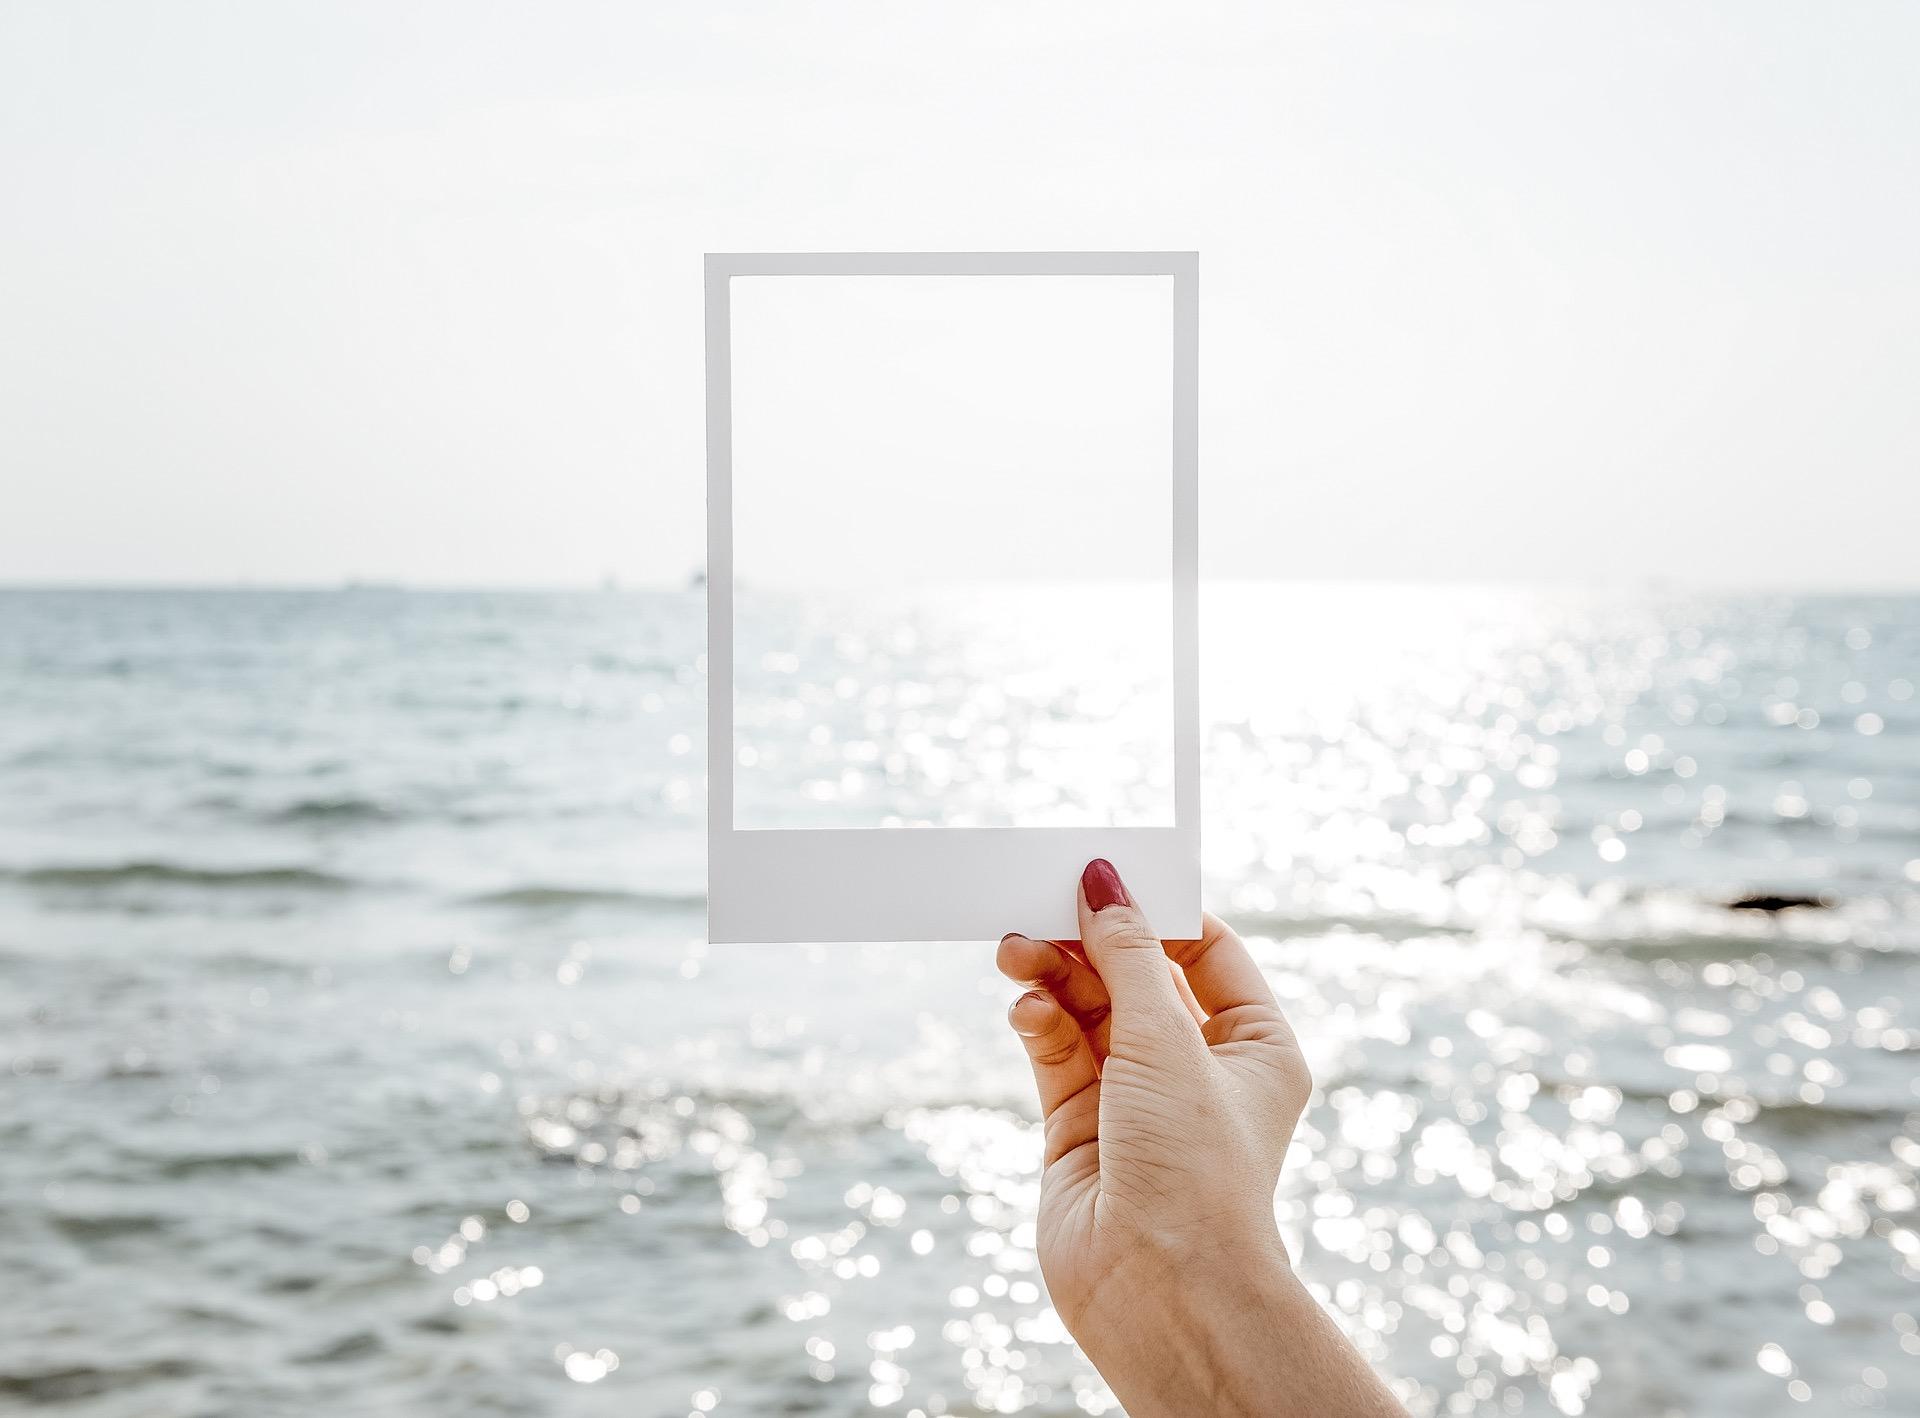 Visionboard visualisieren